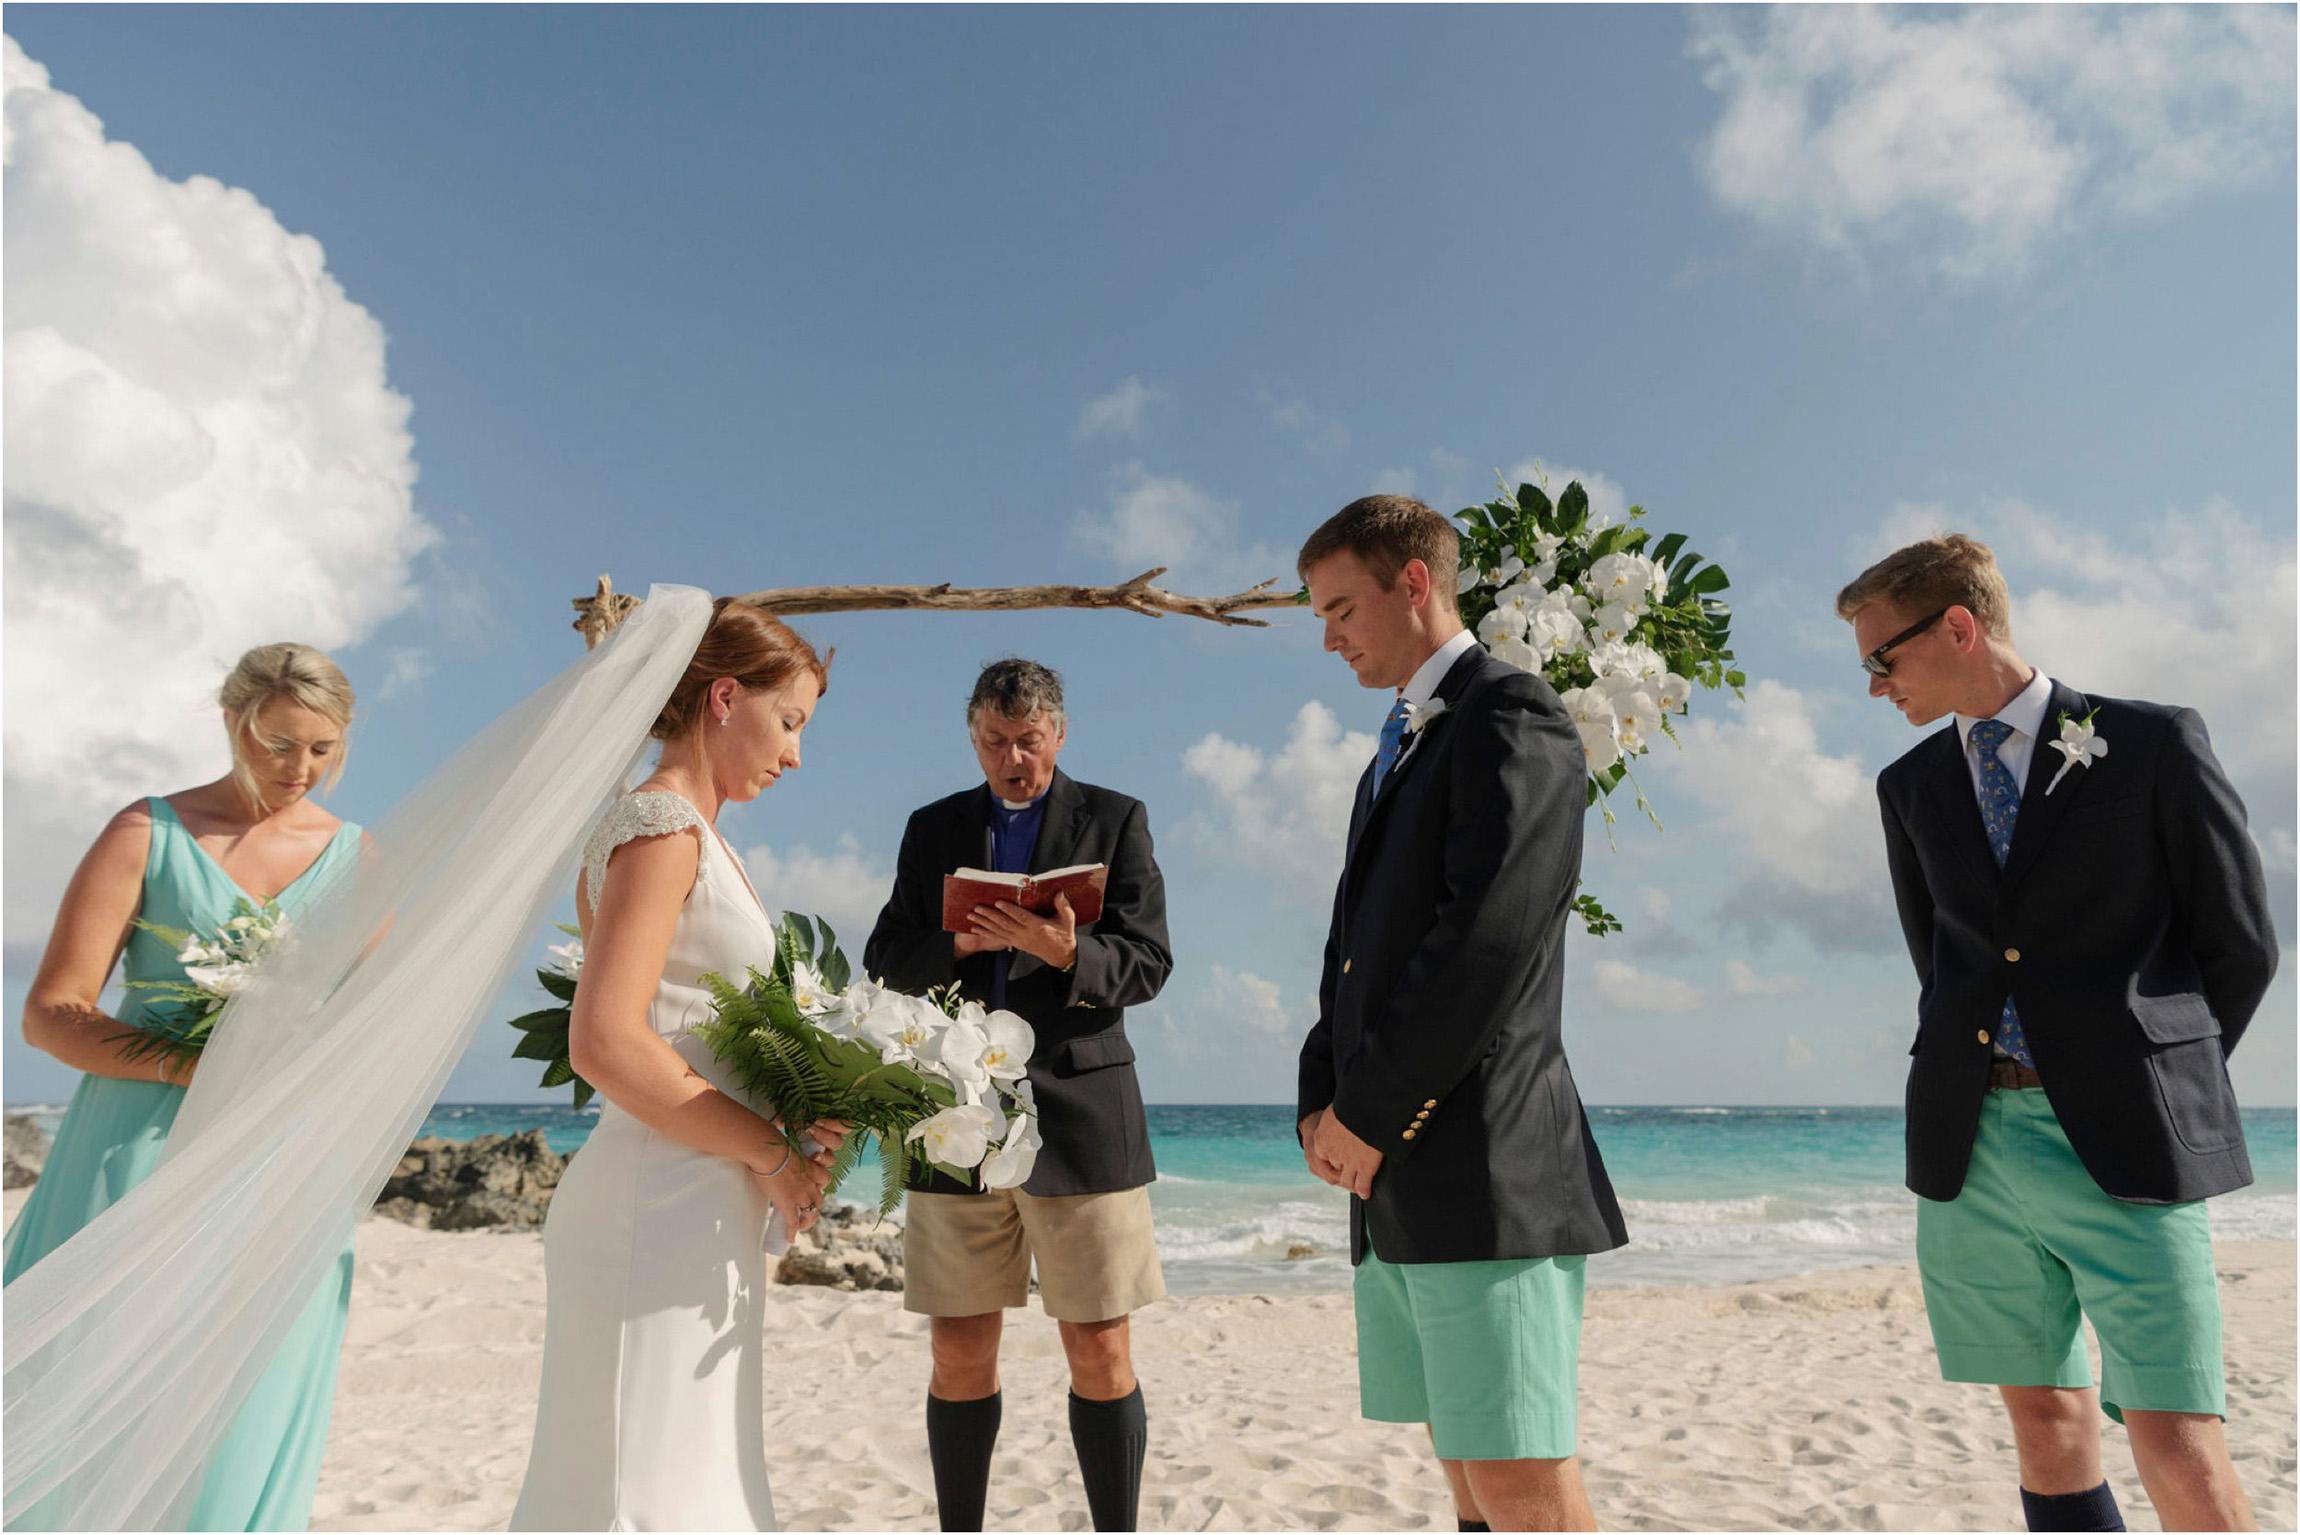 ©FianderFoto_Bermuda Wedding Photographer_Mid Ocean_Rachel_Angus_030.jpg